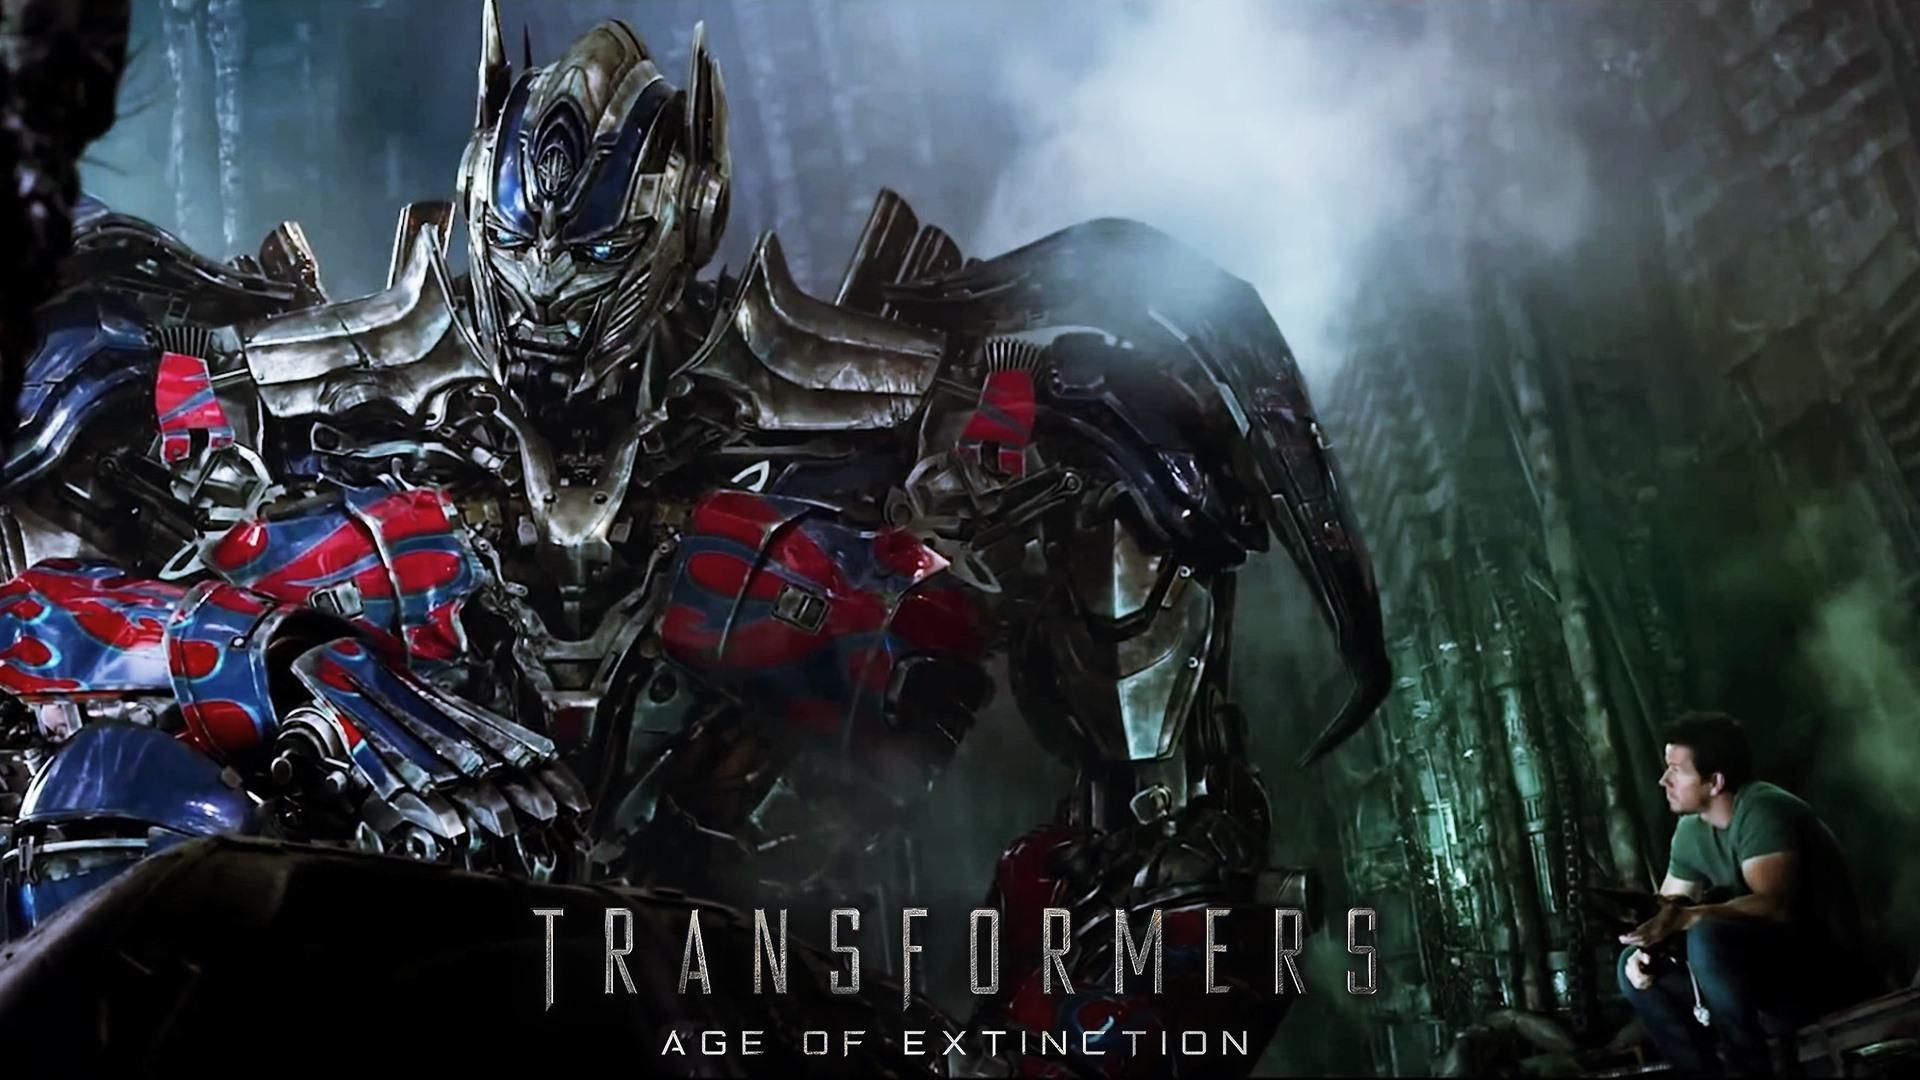 Transformers 5 Hd Wallpapers 1080p Download Tranformers Age Extinction Sci Fi Futuristic Robot Mecha